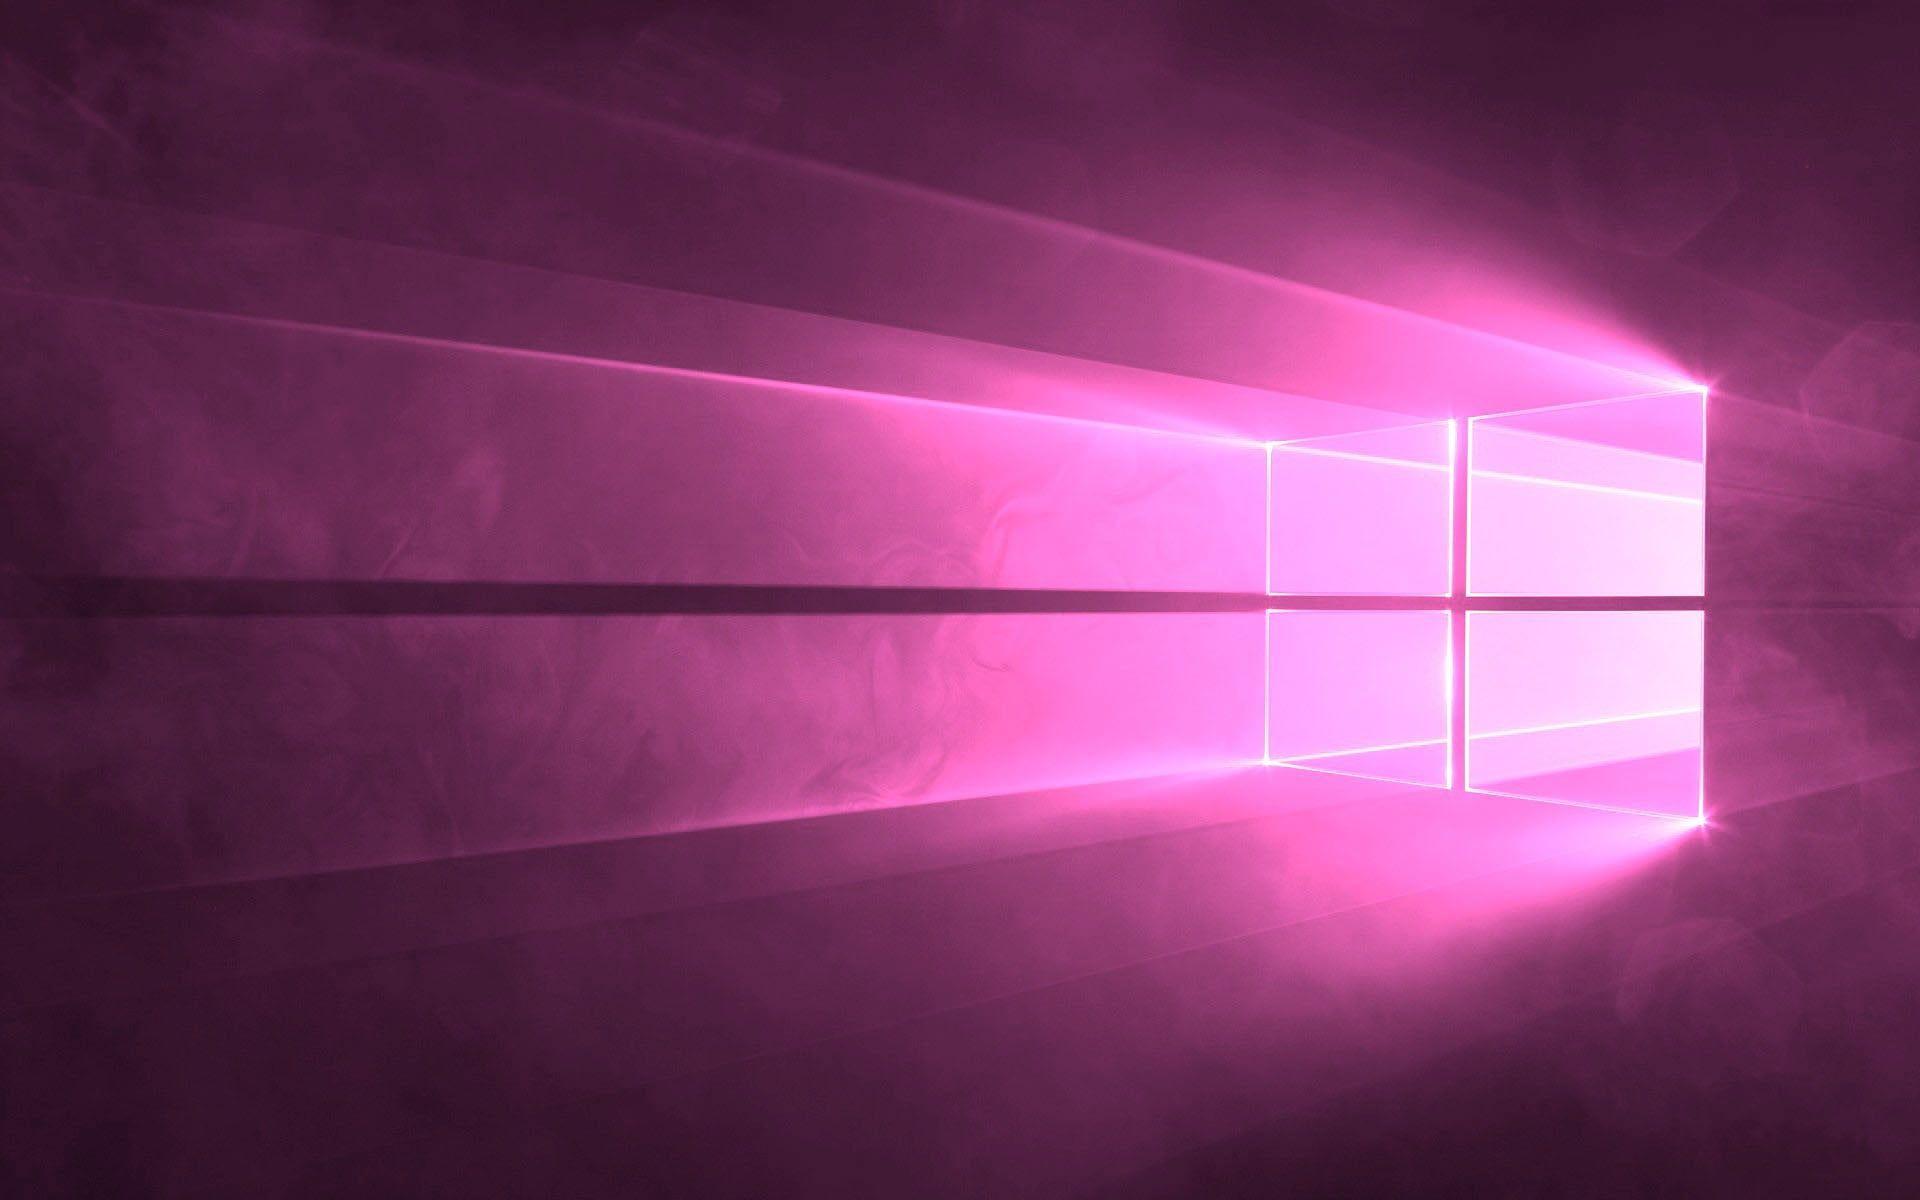 Untitled Windows 10 Microsoft Windows Operating System Logo Magenta Pink Pink Back In 2021 Microsoft Windows Operating System Windows 10 Microsoft Microsoft Windows